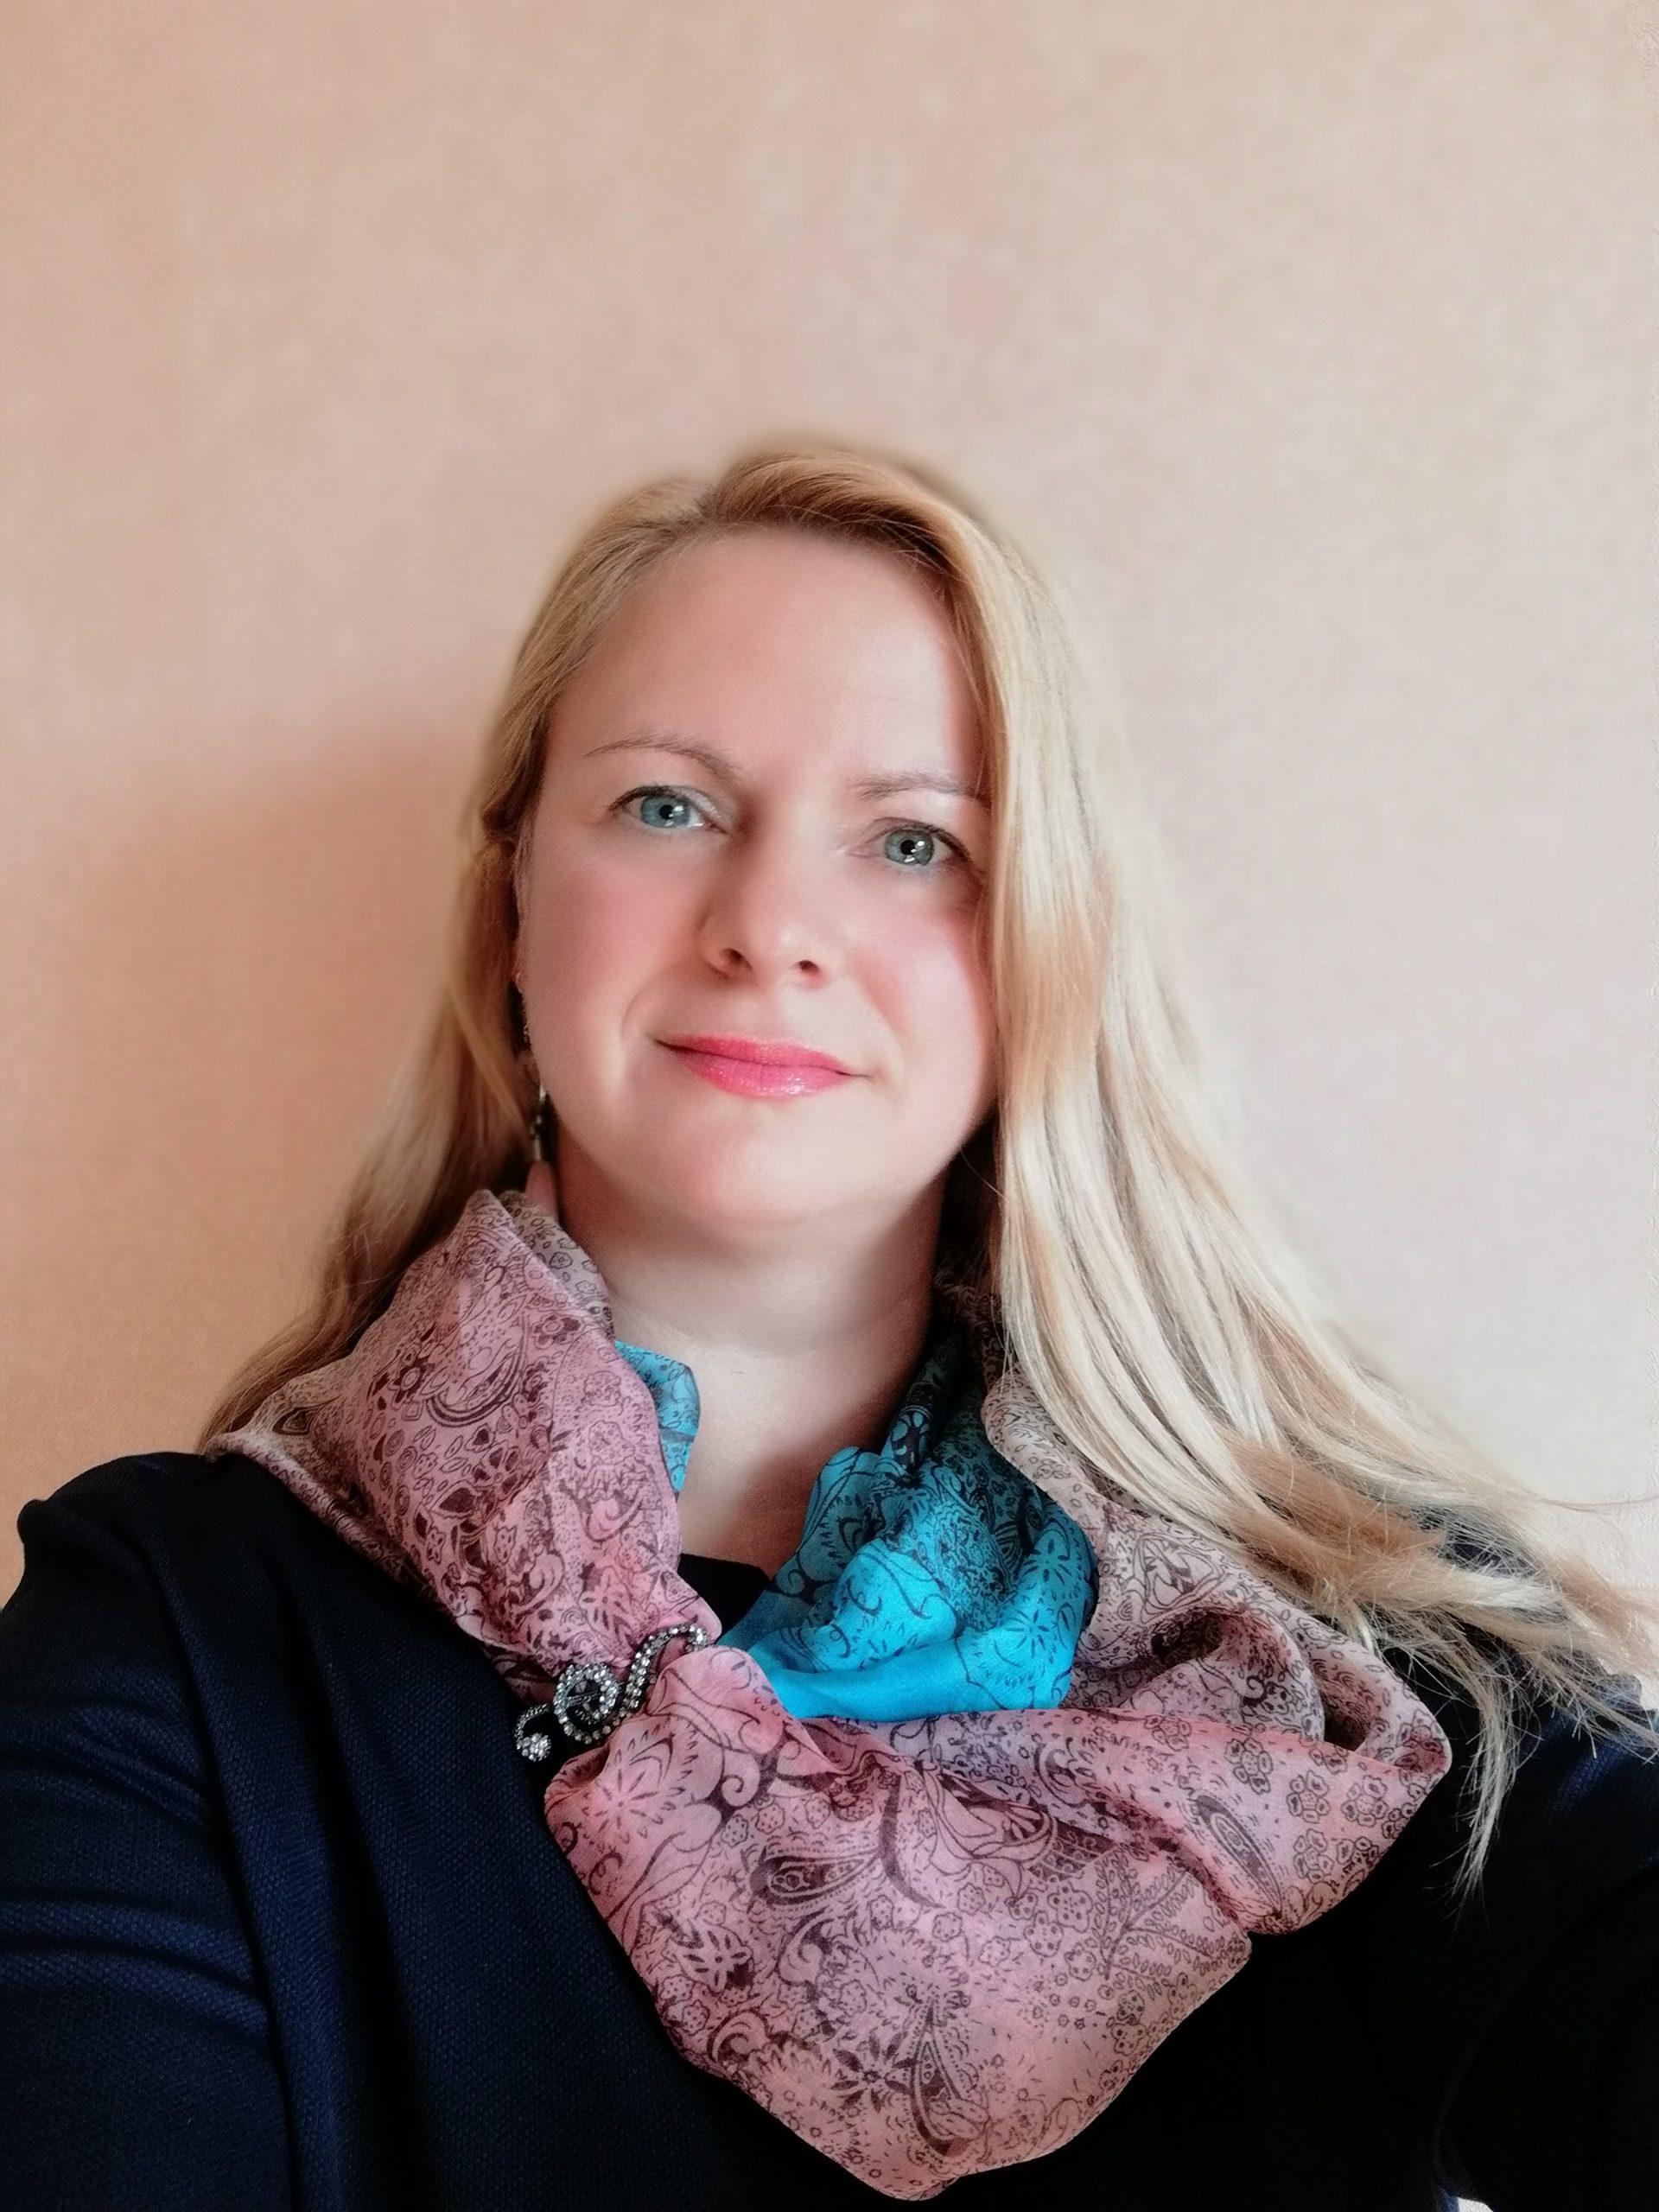 Andžela Hilo-Lukševica